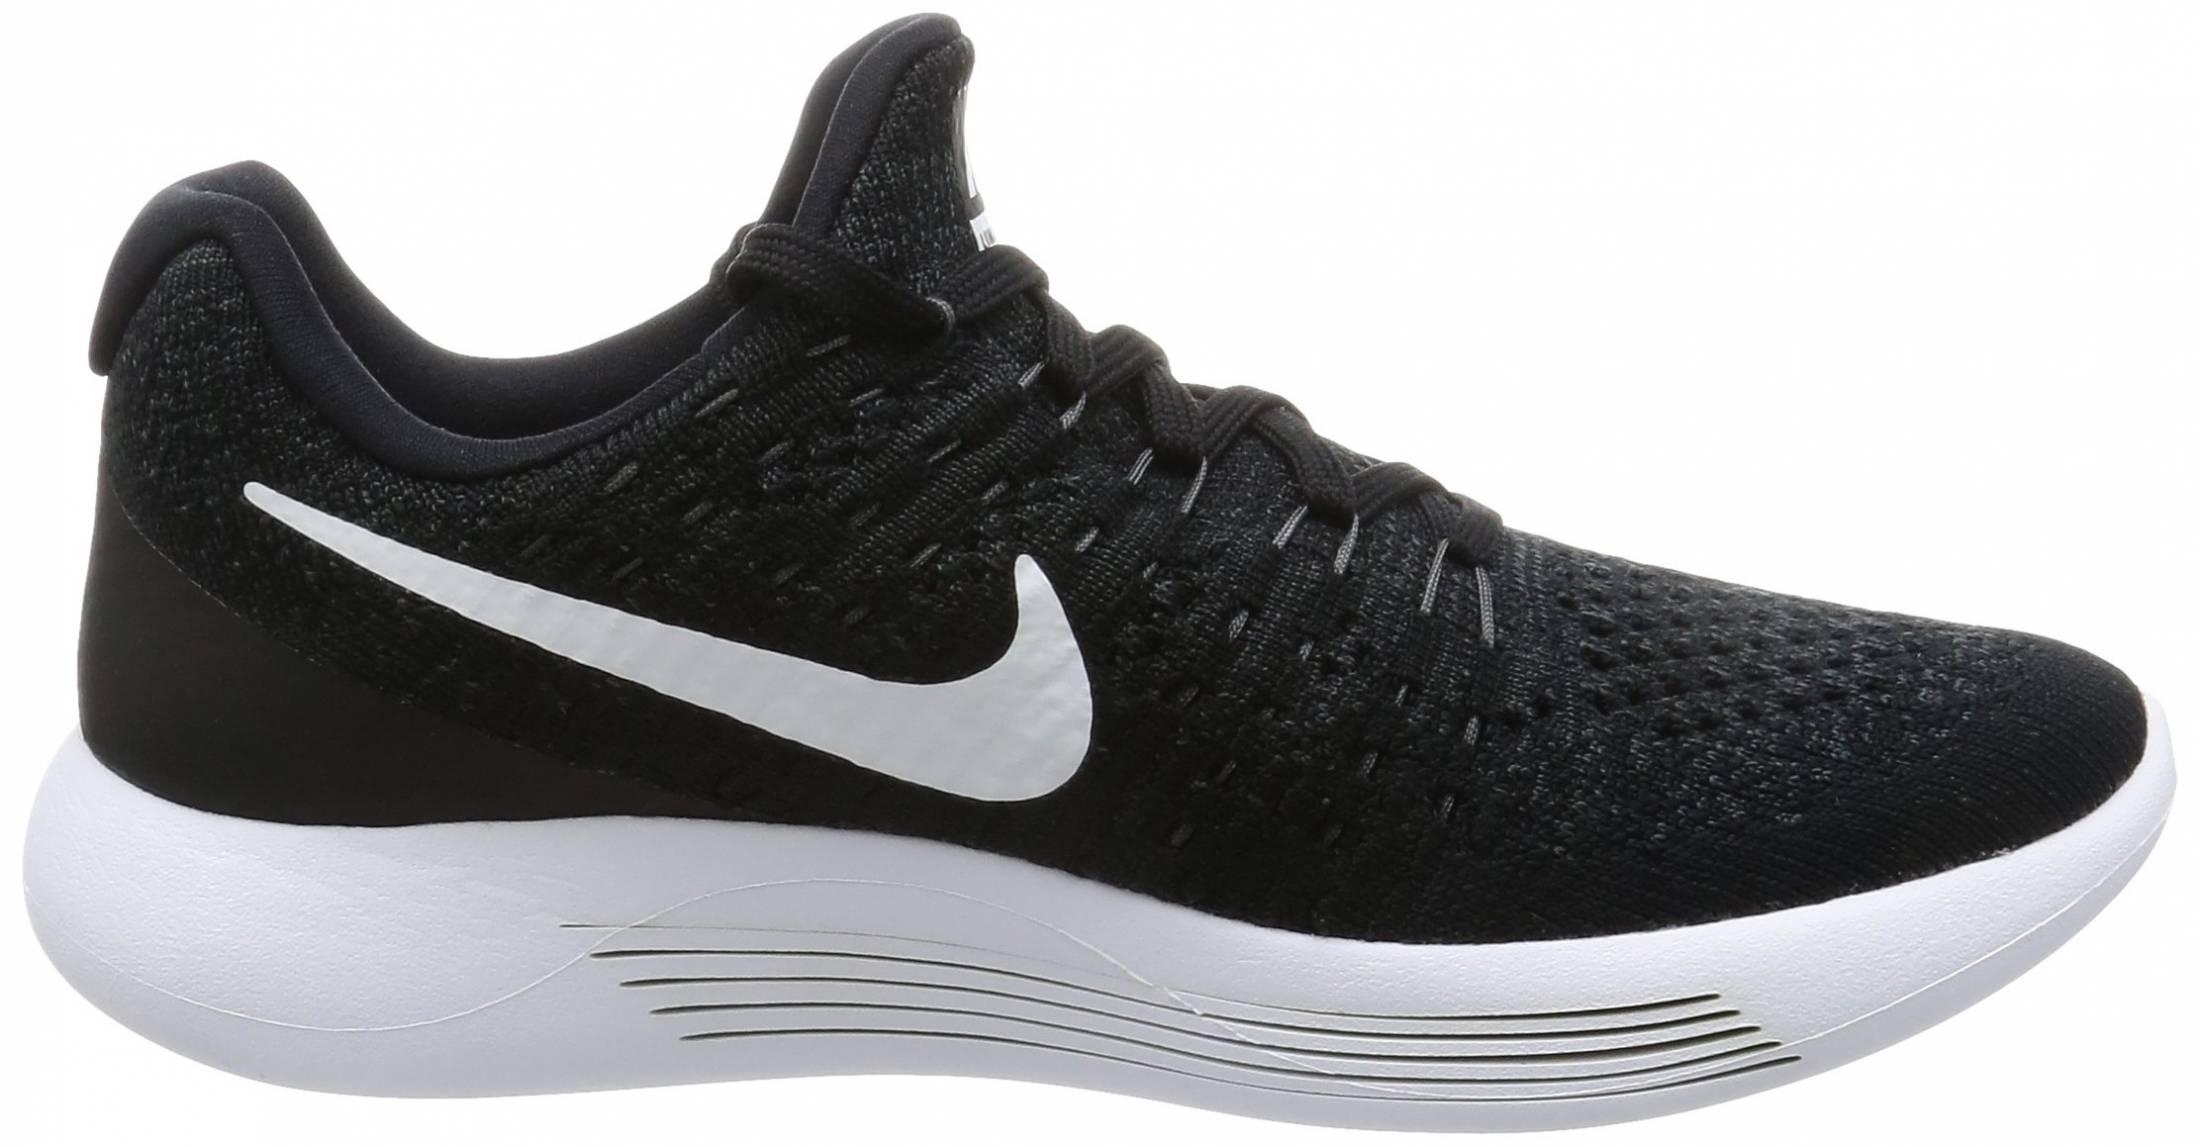 recuerdos giratorio Dar  Nike LunarEpic Low Flyknit 2 - Deals ($120), Facts, Reviews (2021)    RunRepeat